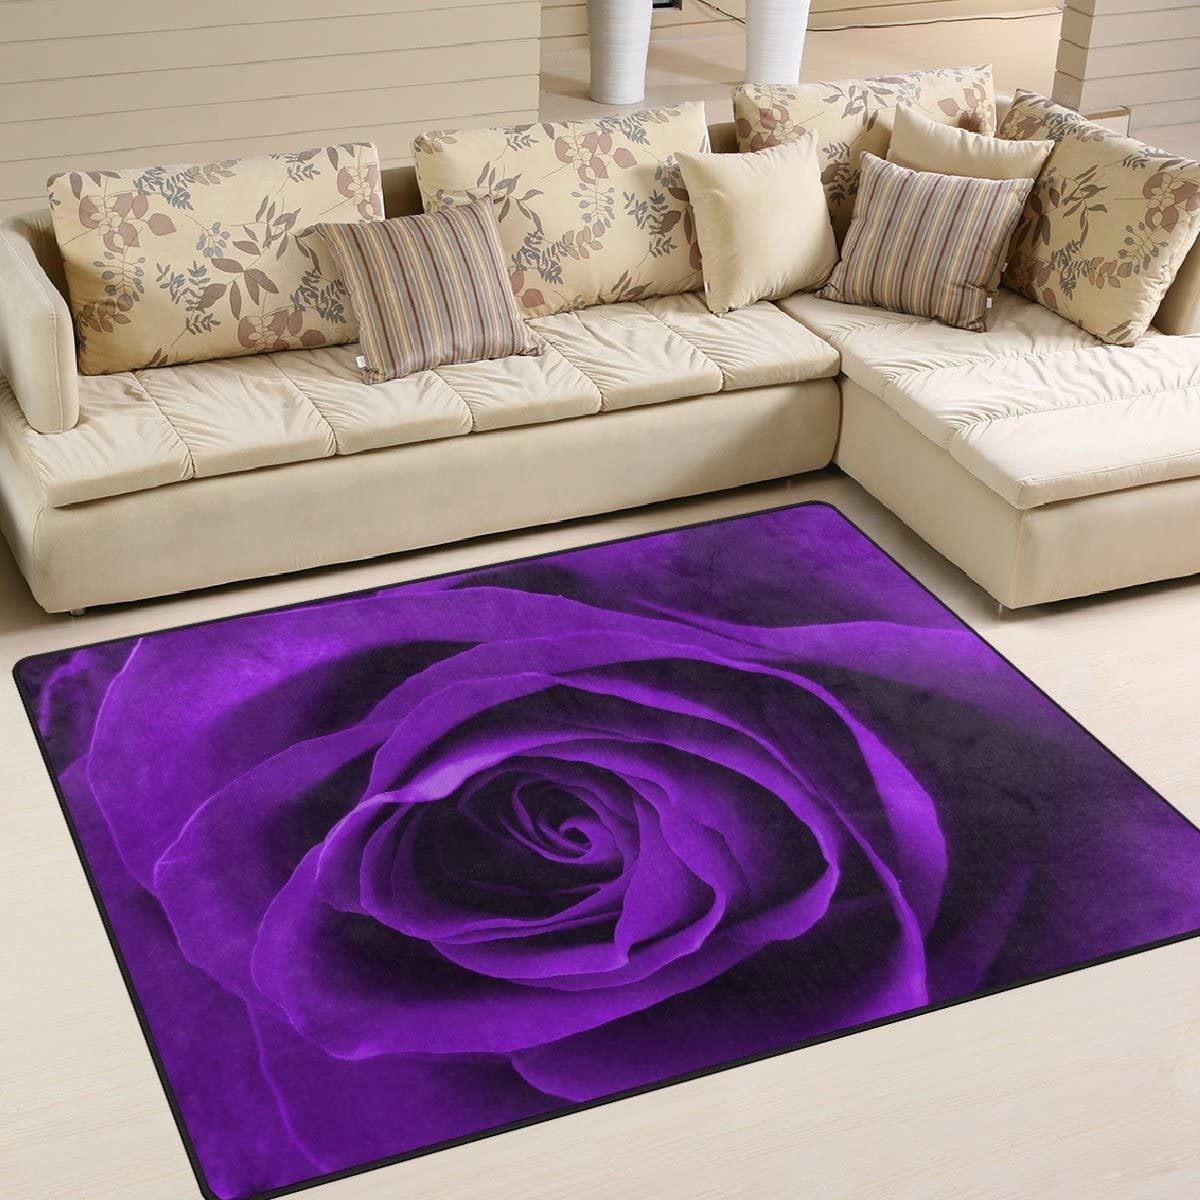 ALAZA Purple Rose Flower Valentine's Day Area Rug Rugs for Living Room Bedroom 5'3